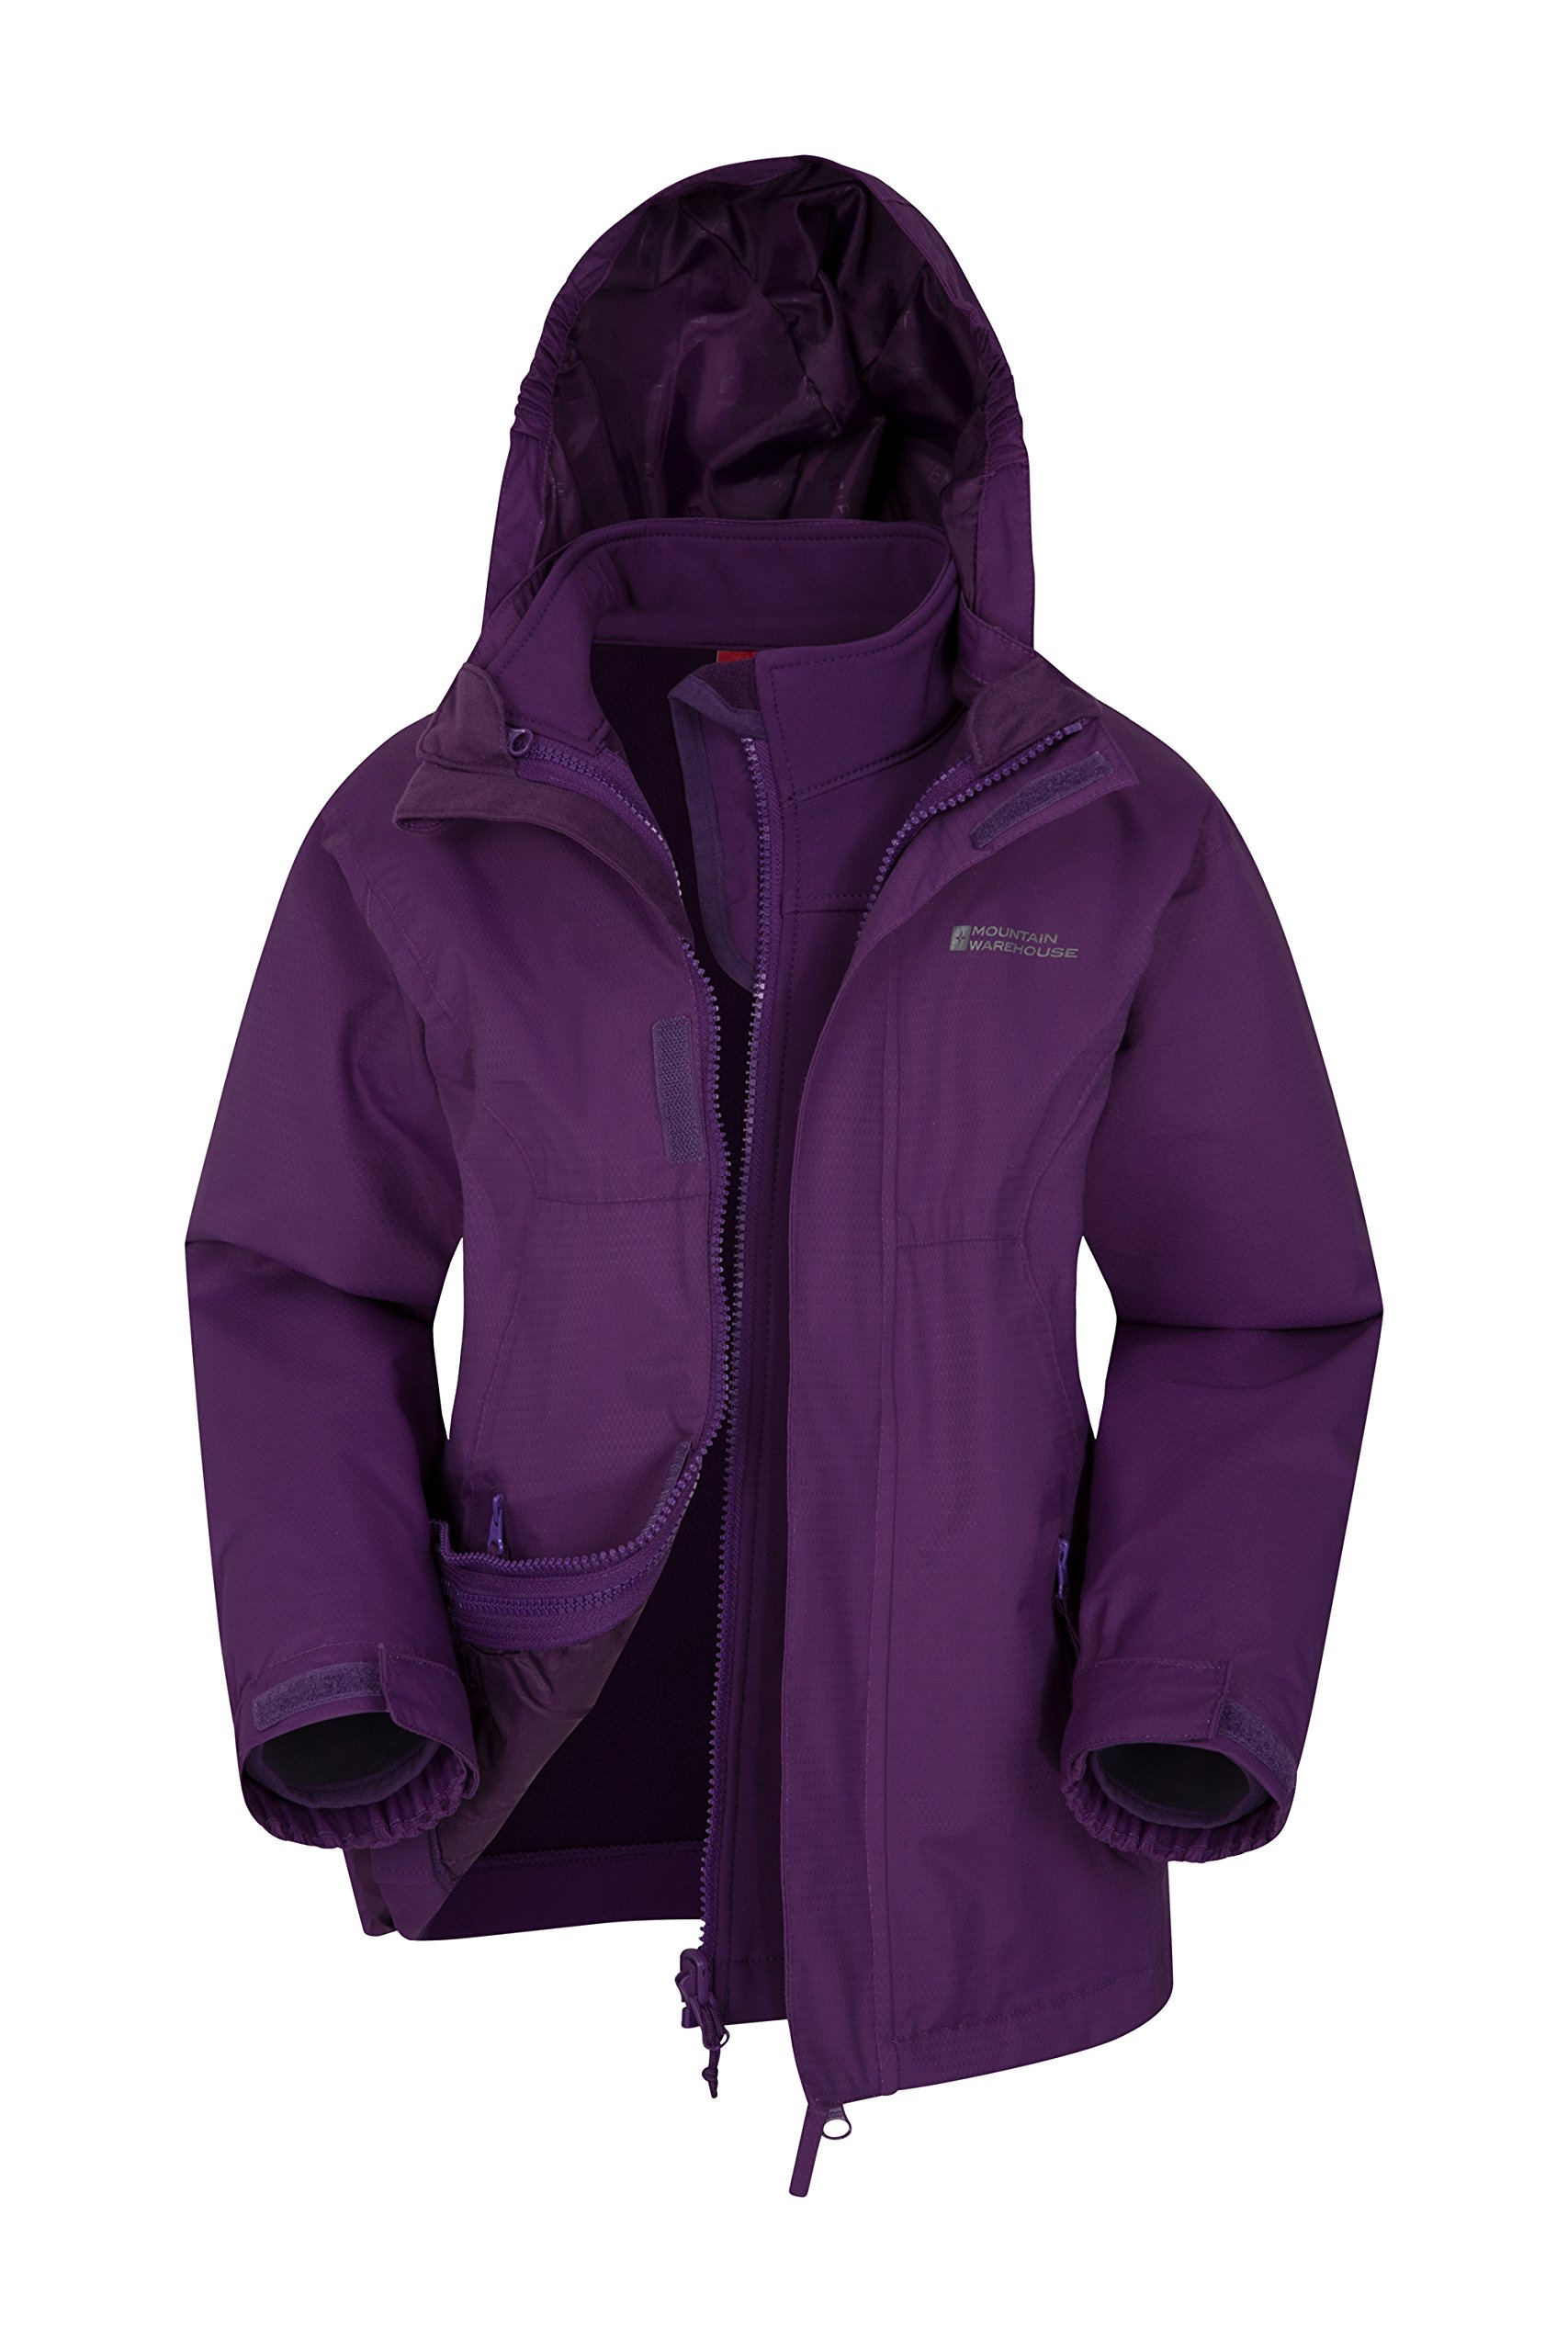 Mountain Warehouse Bracken Extreme Kids 3 in 1 Jackets - Waterproof Boys & Girls Rain Jacket, Breathable, Taped Seams, Mesh Lined Kids Coat - for Winter Travelling